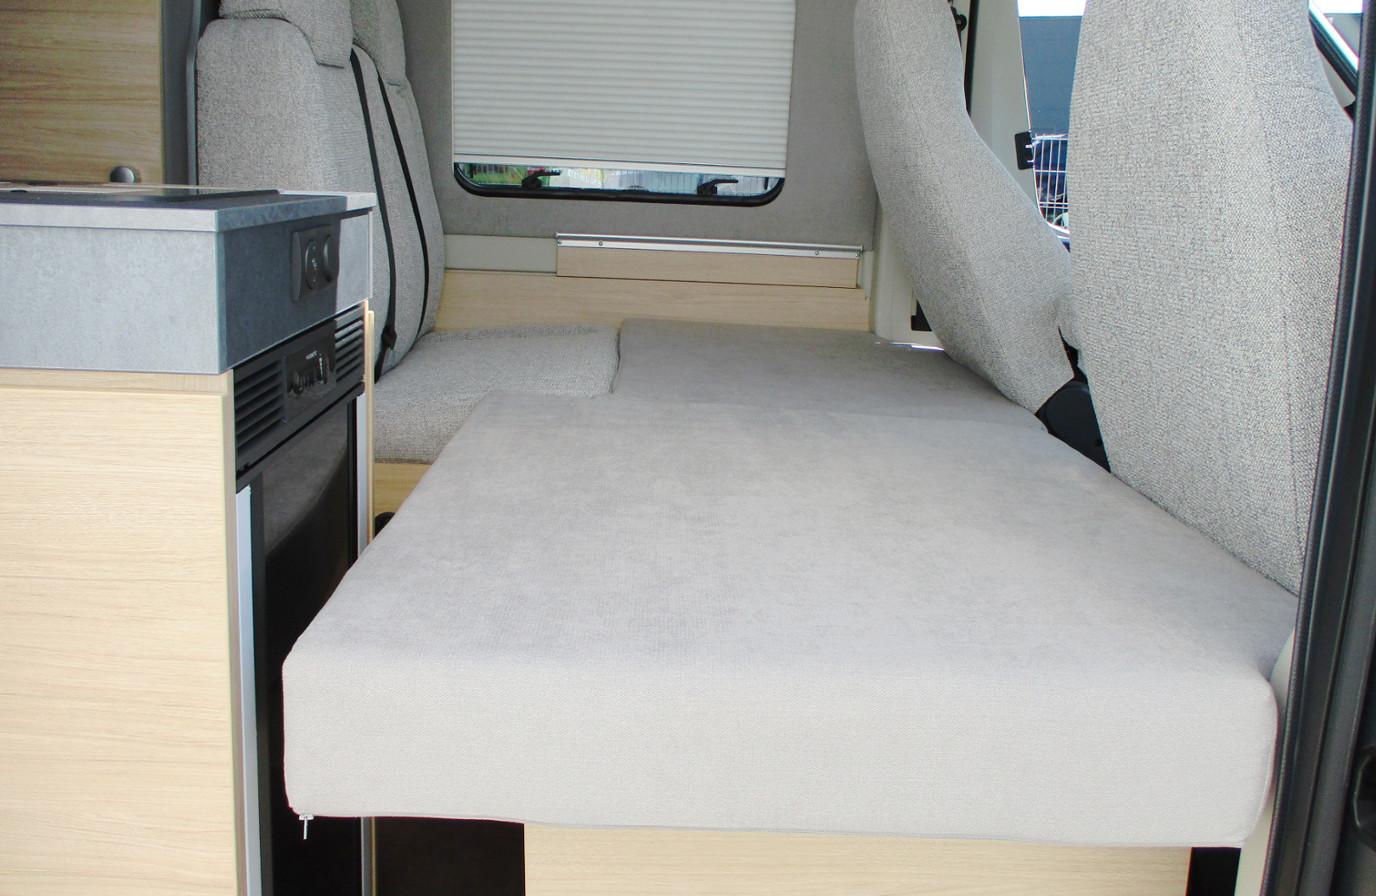 Wohnmobil mieten - Summit 640 - 3. Schlafplatz